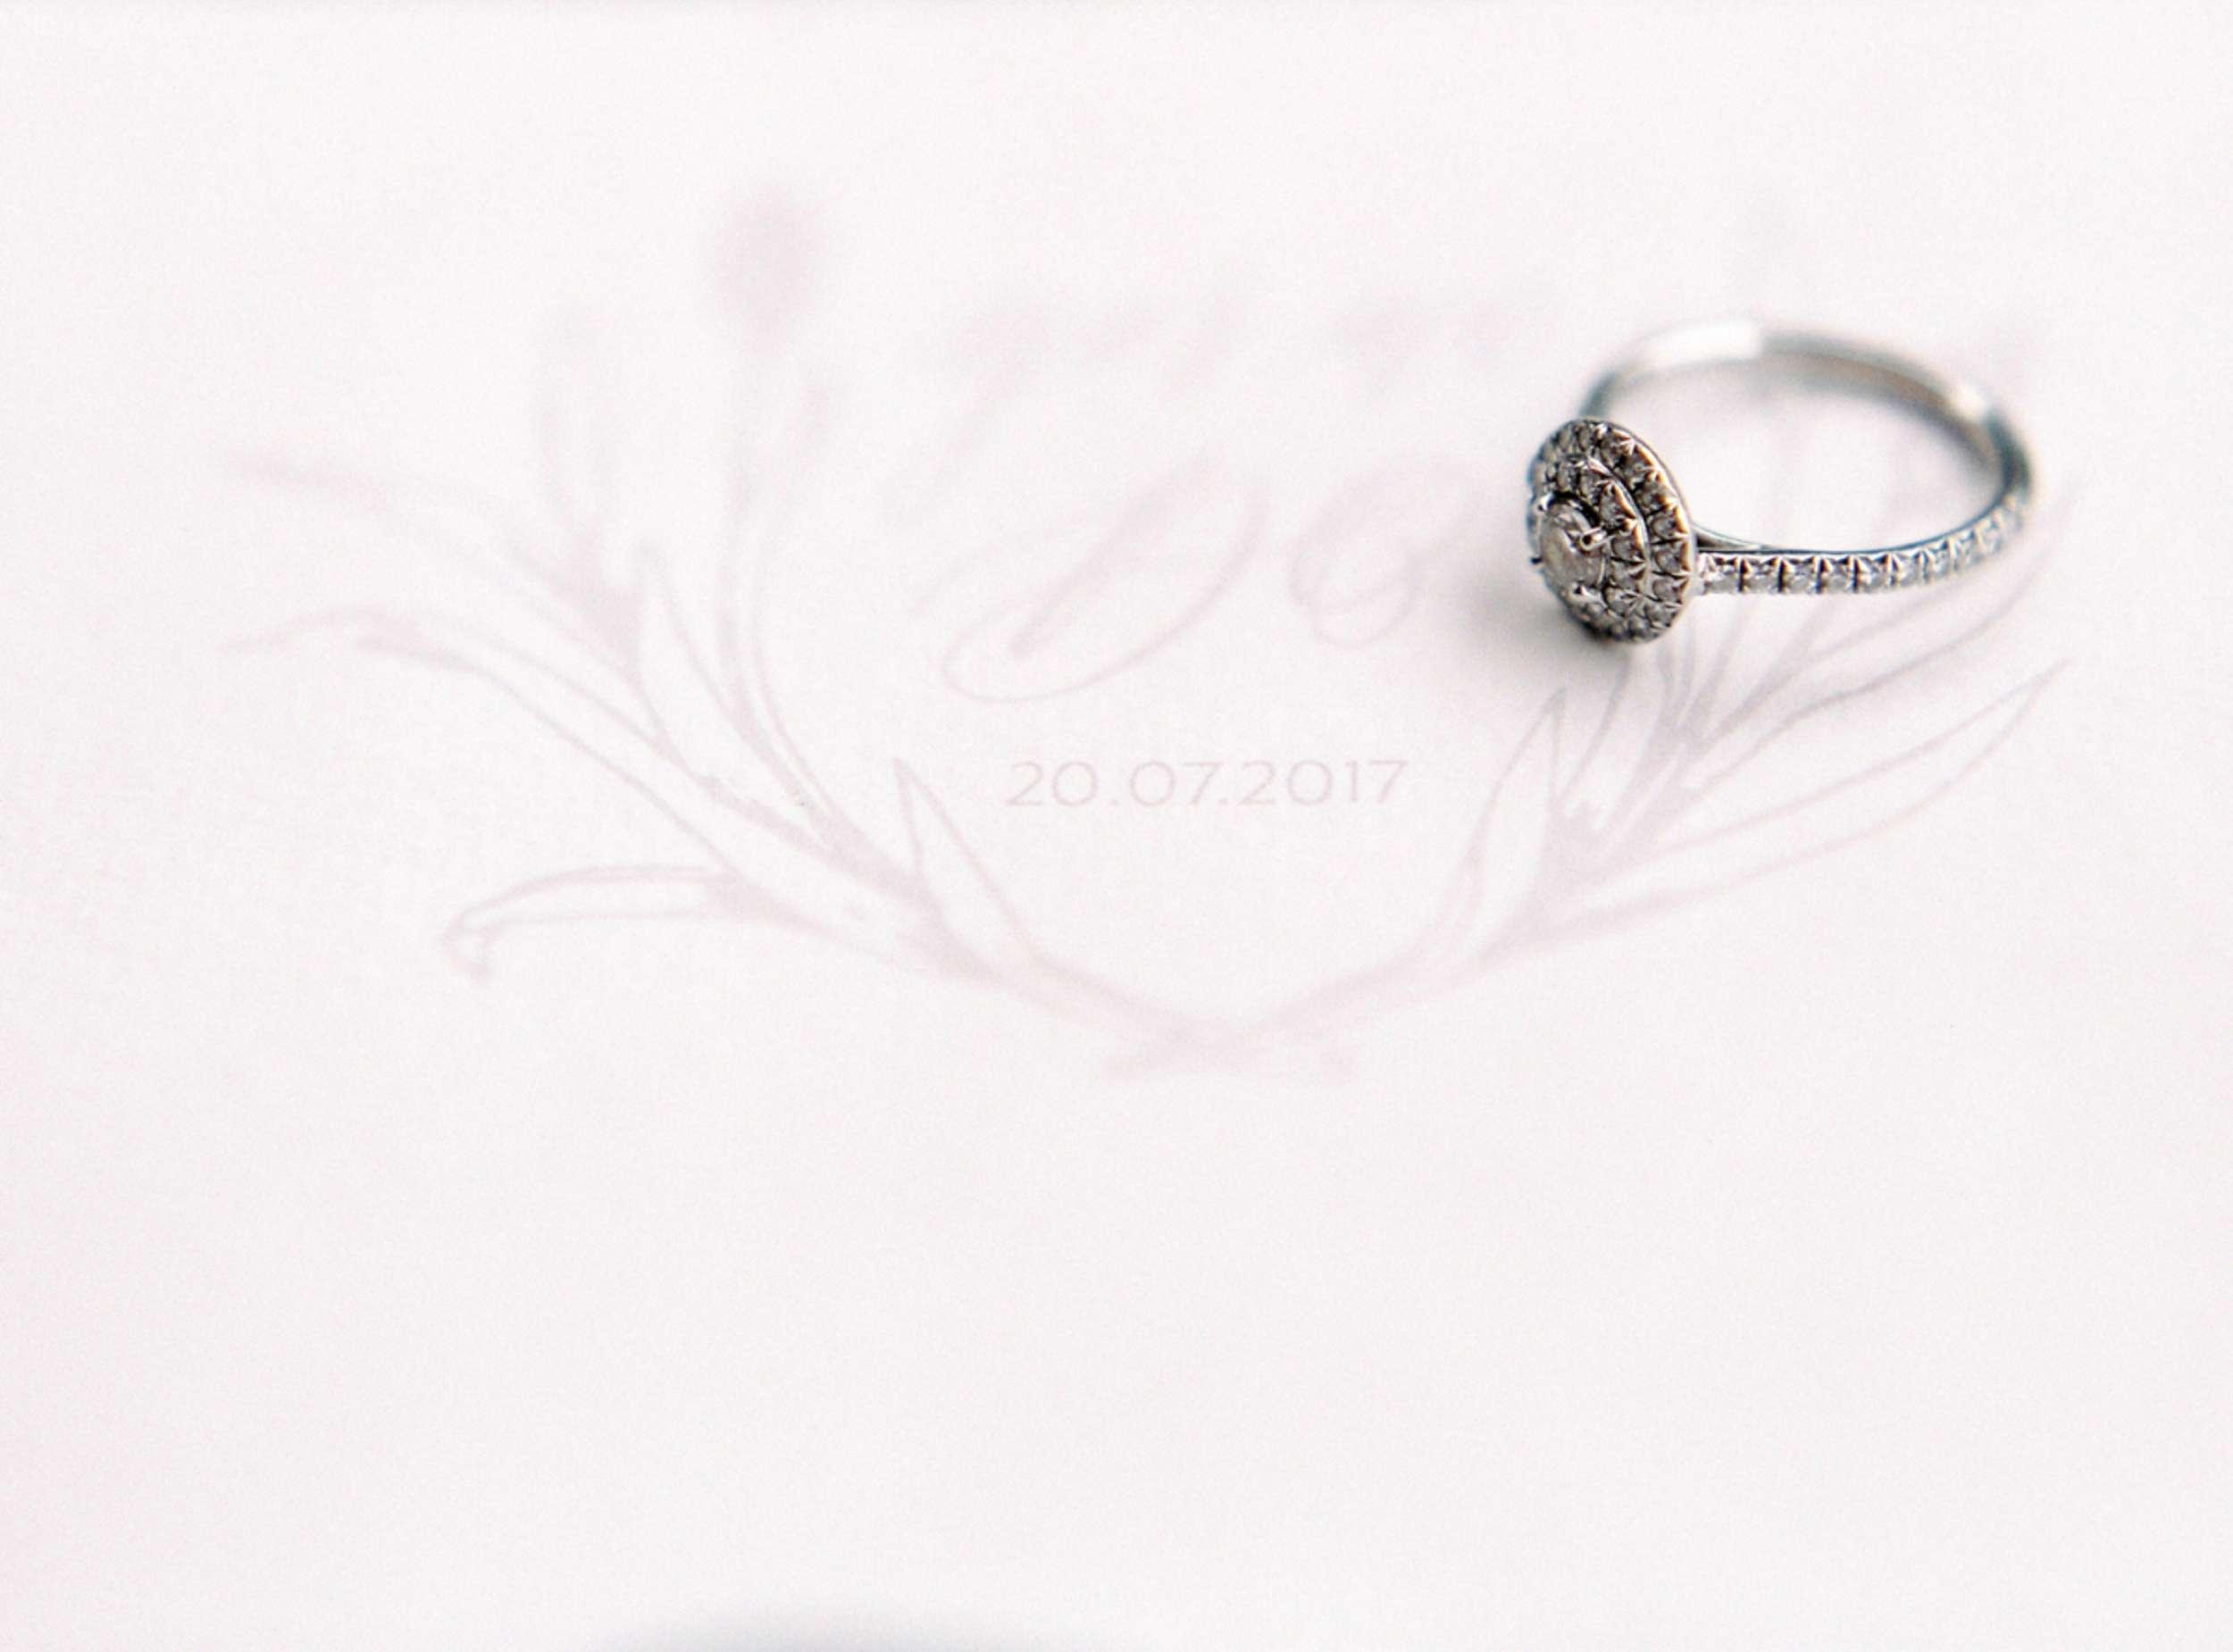 calligraphy monogram with engagement ring diamond